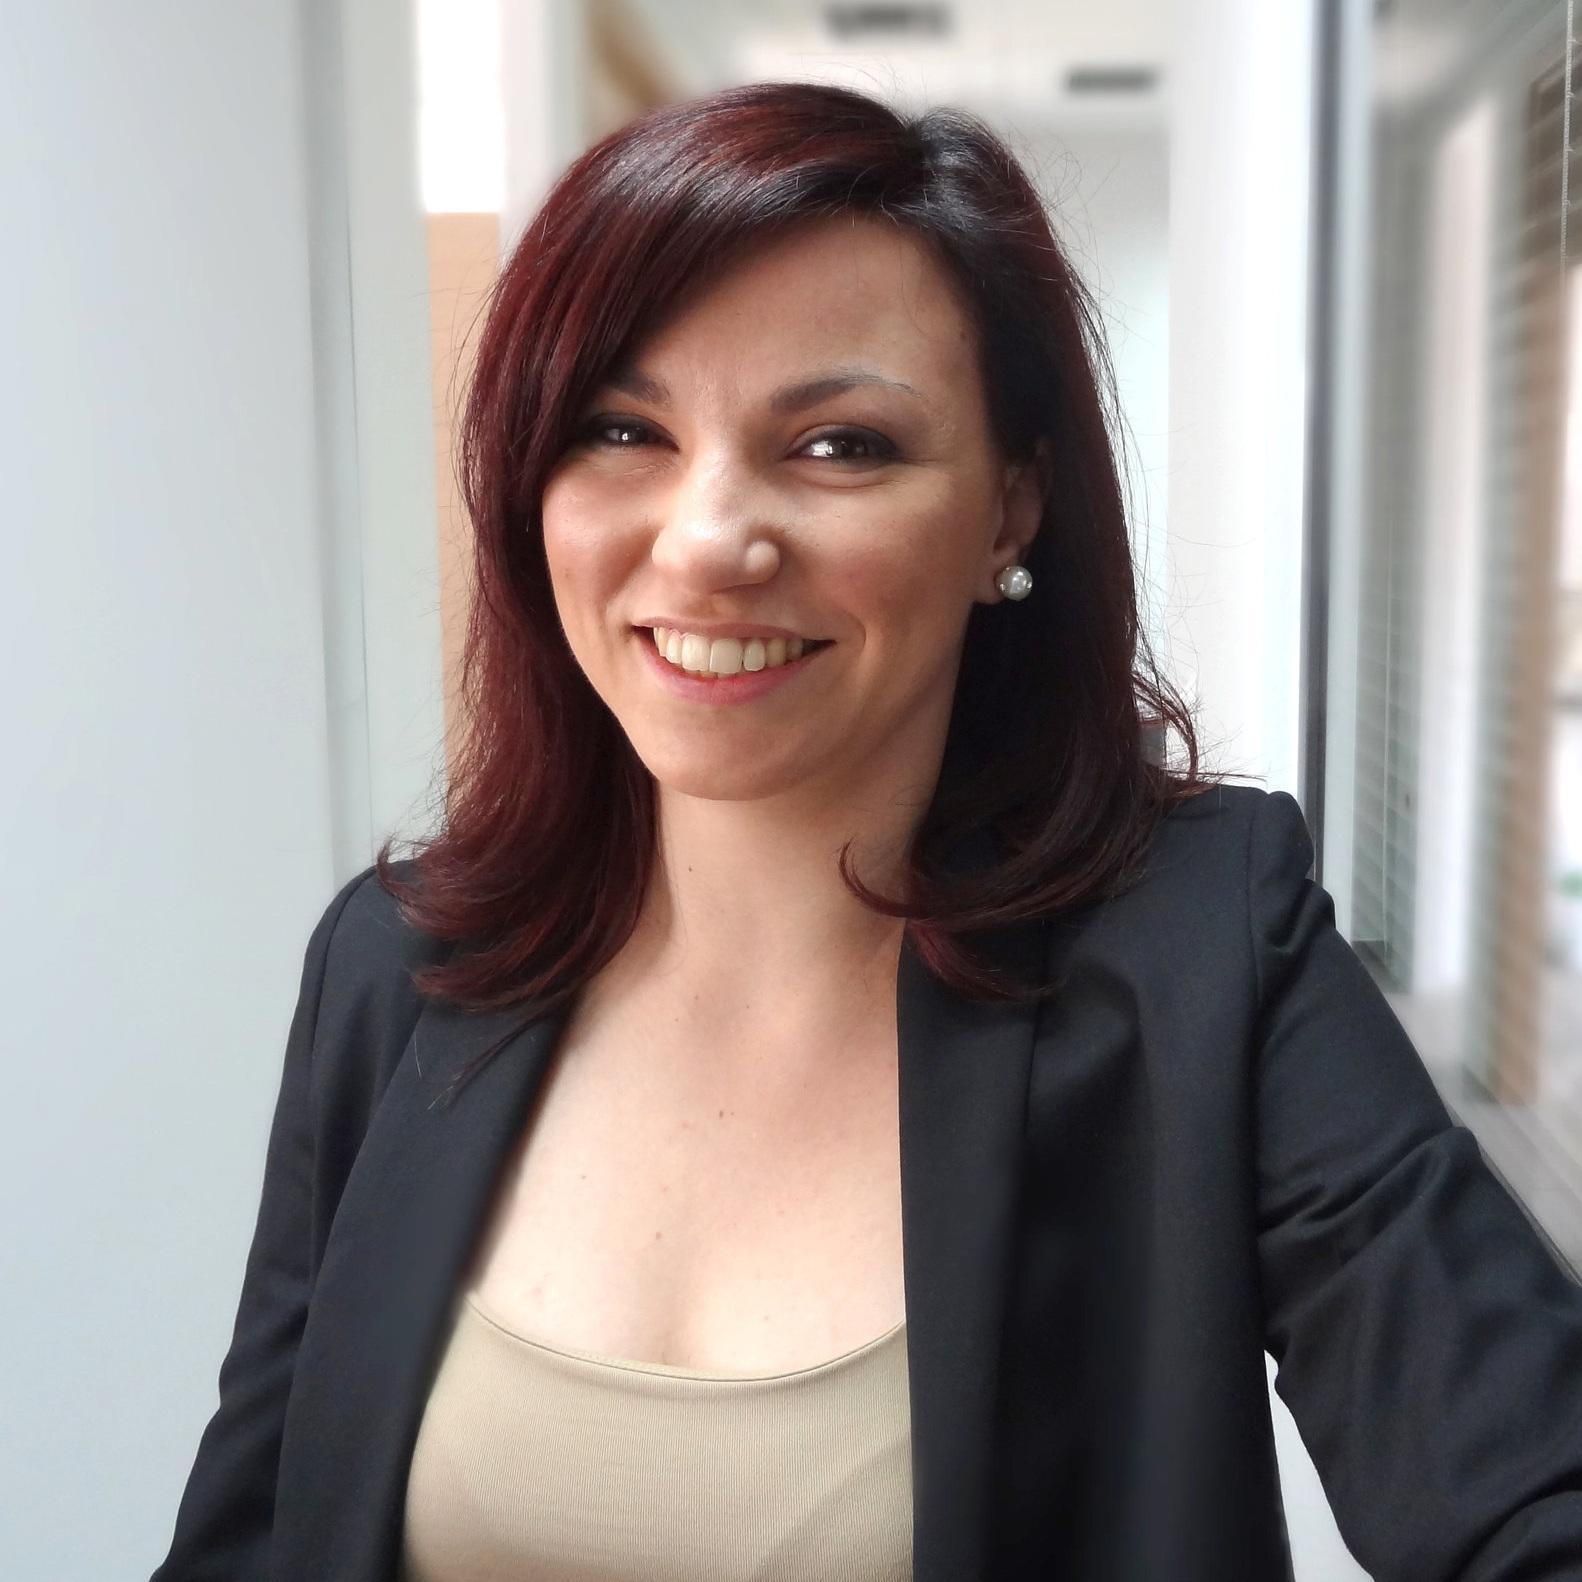 Evgenia Koukaroudi  Certified Public Accountant  ekoukaroudi@metronauditing.gr